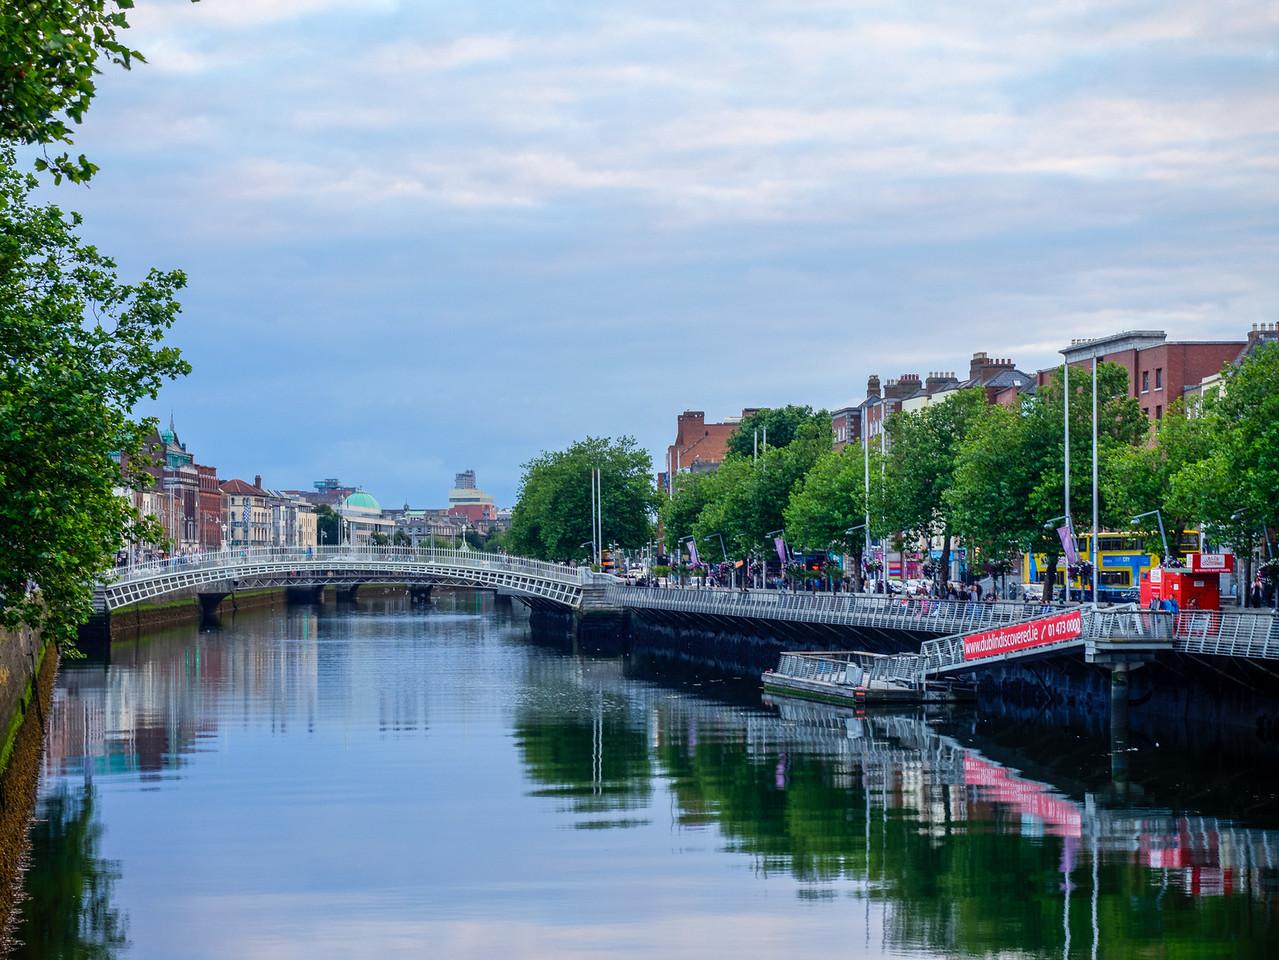 Dublin – the River Liffey